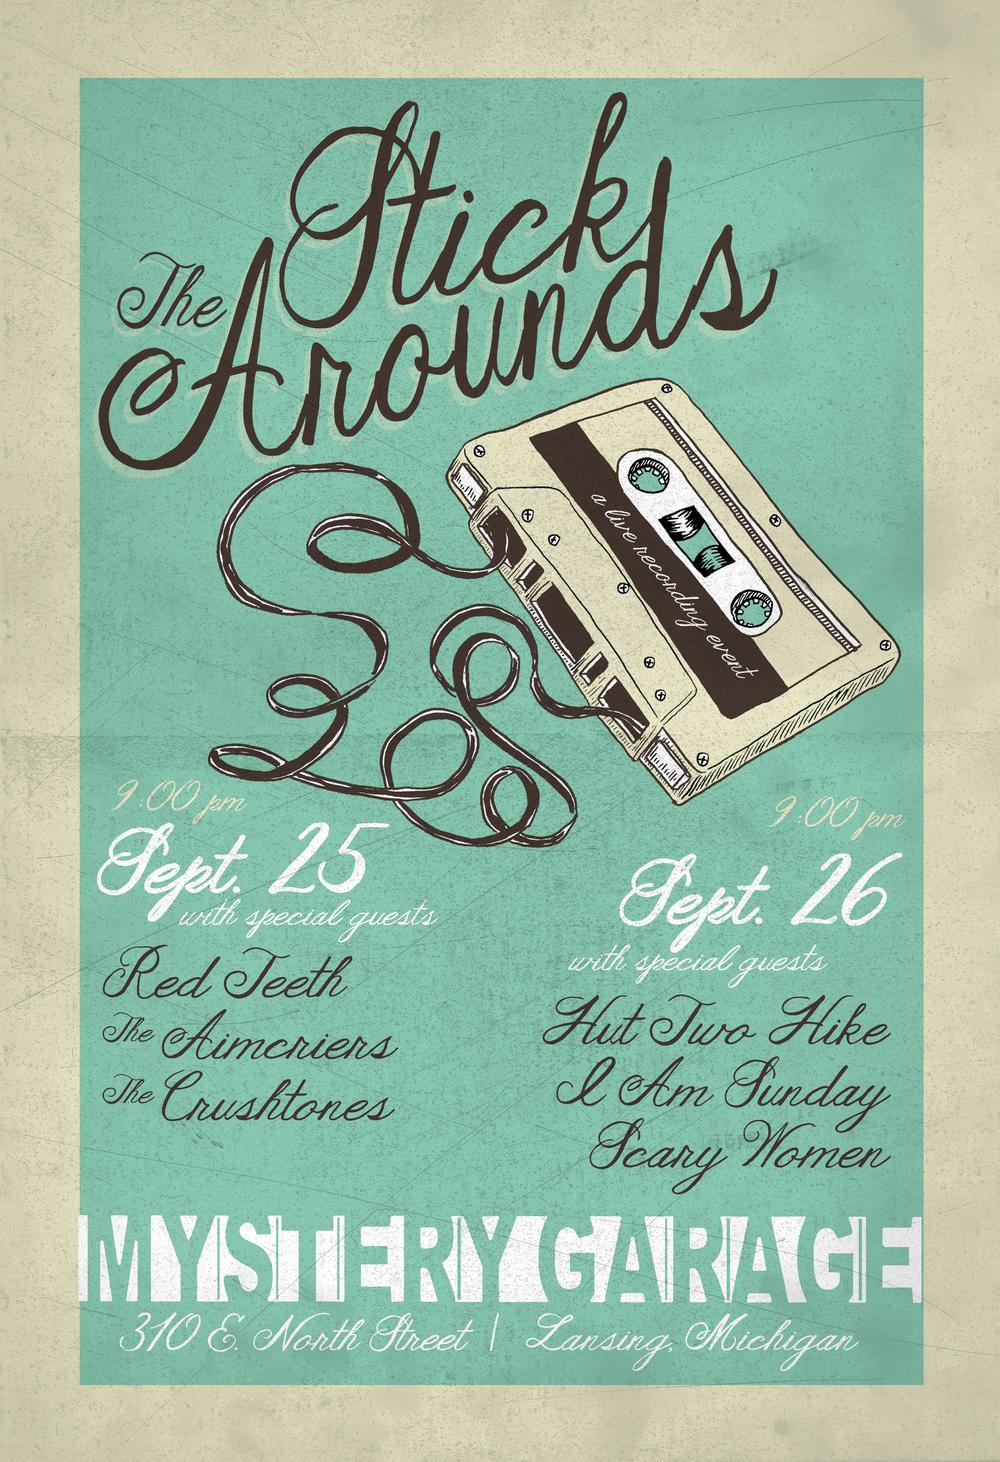 Stick Arounds Mystery Garage Poster Sept. 2015.jpg